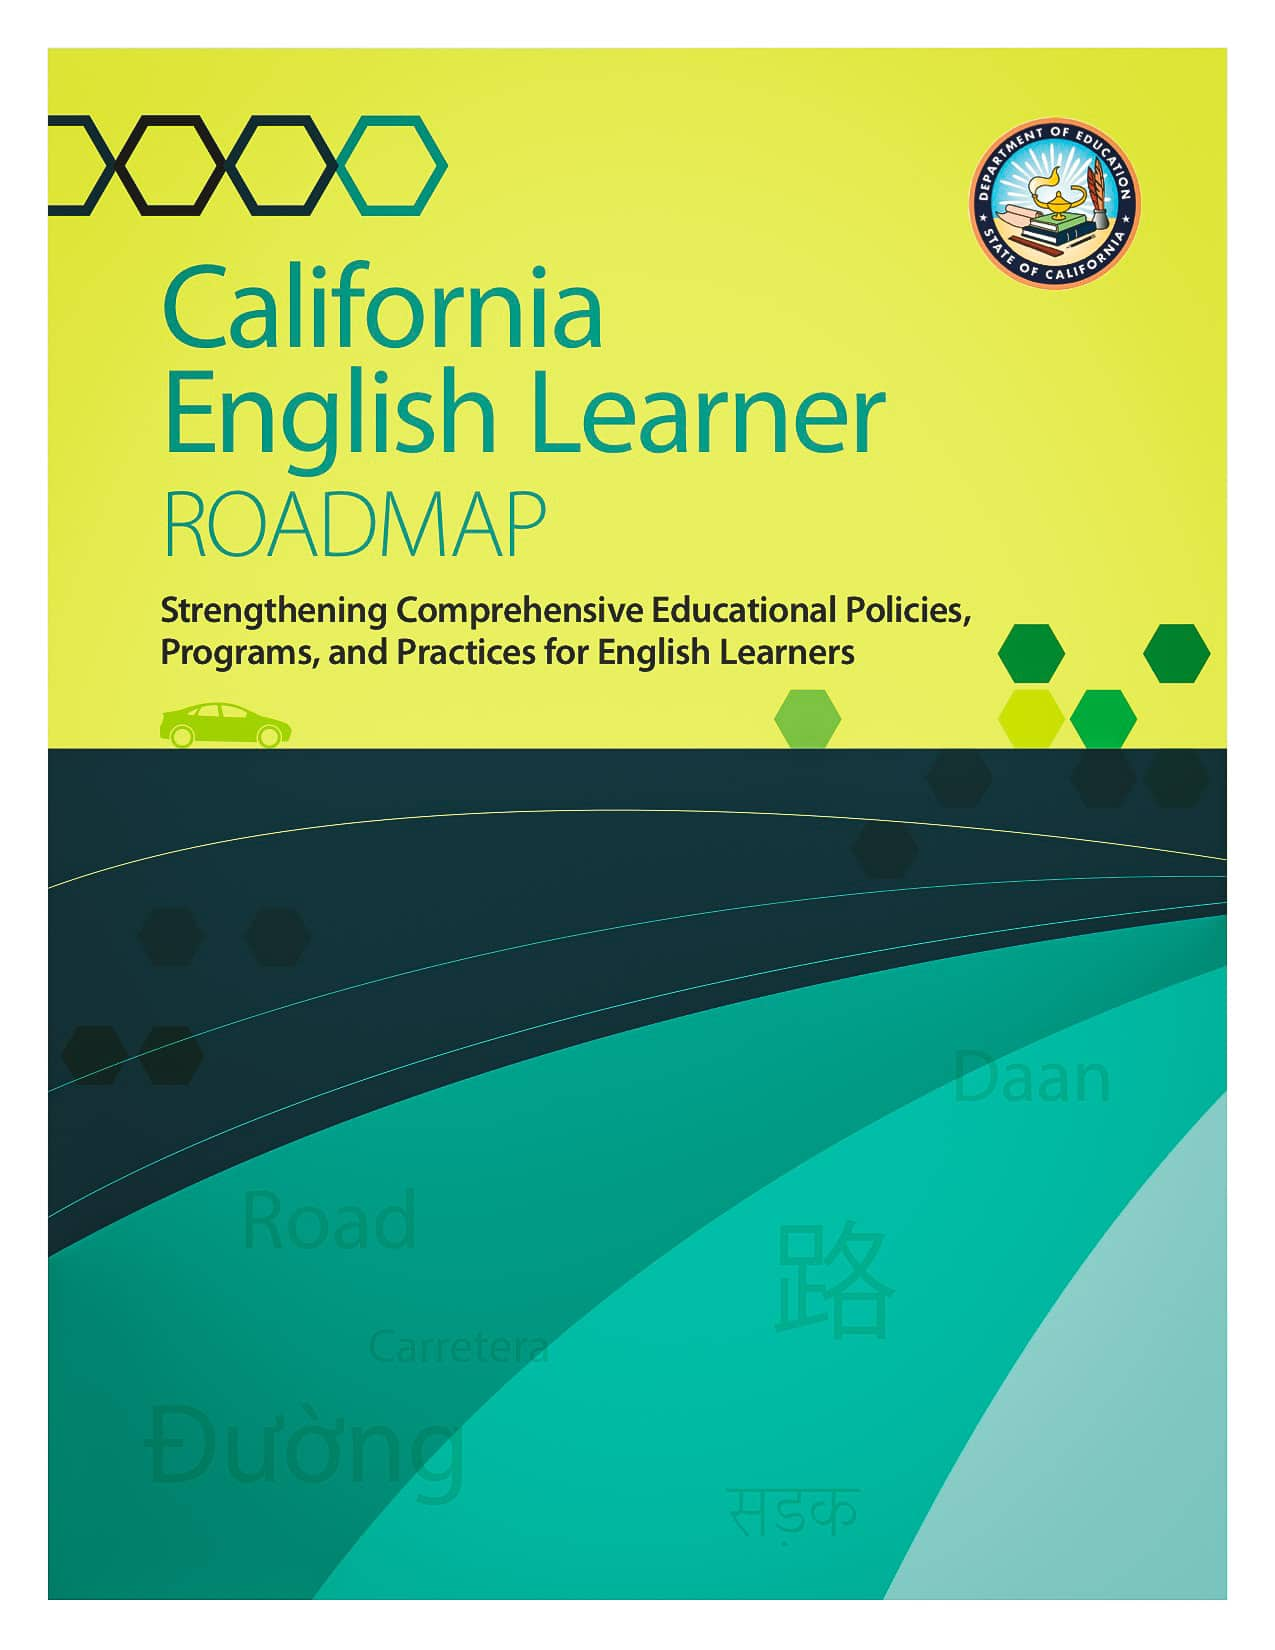 English Learner Roadmap